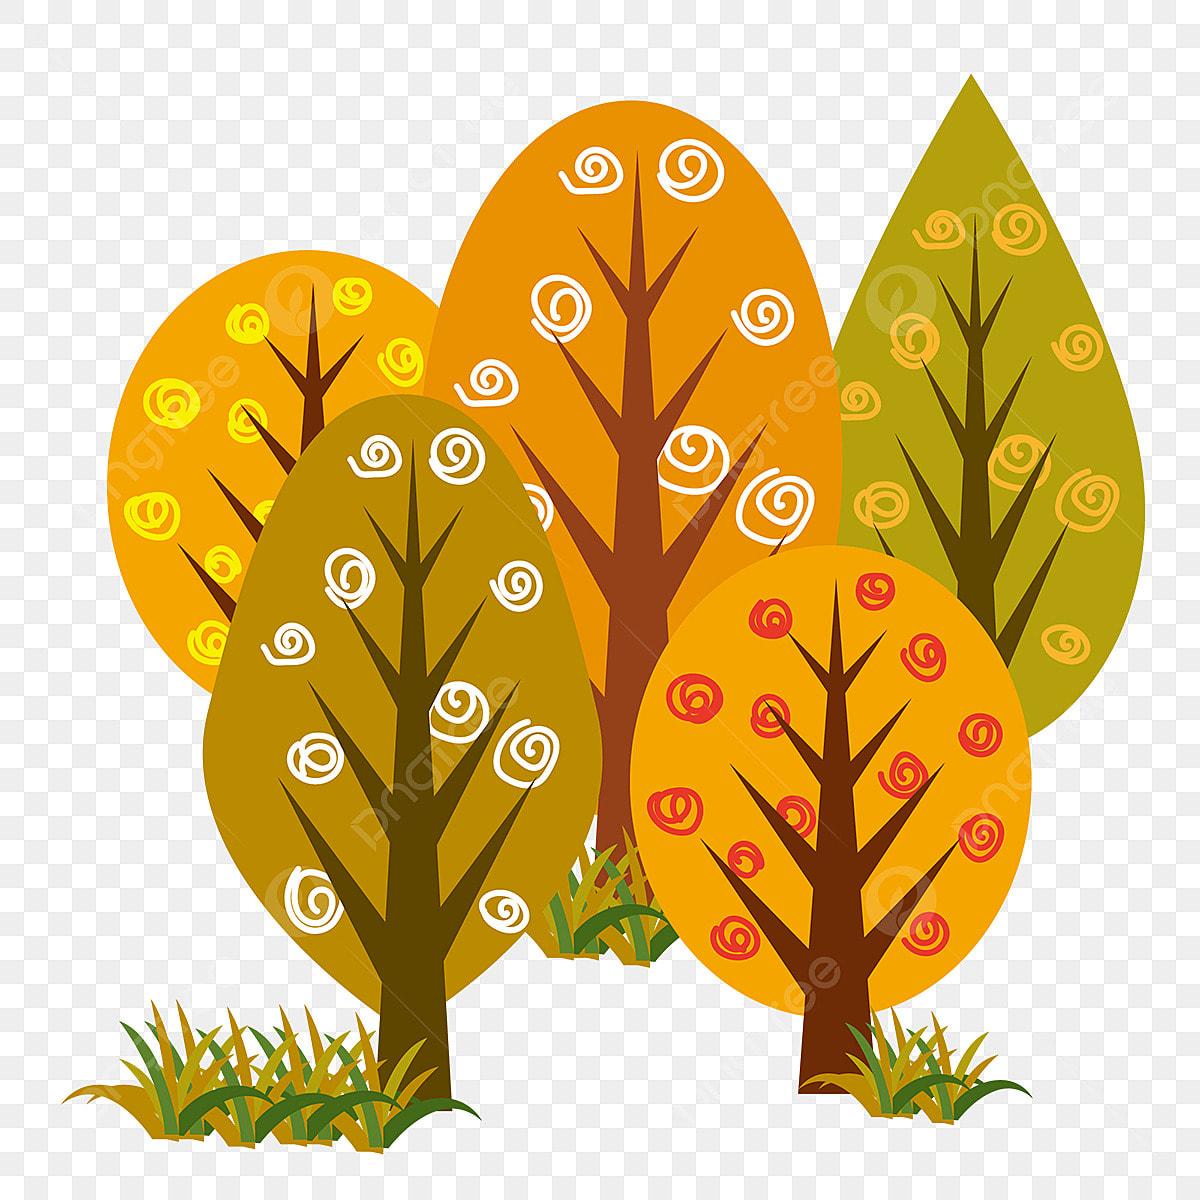 Desenho Feito A Mao Arvores Ilustracao Arvore Planta A Natureza